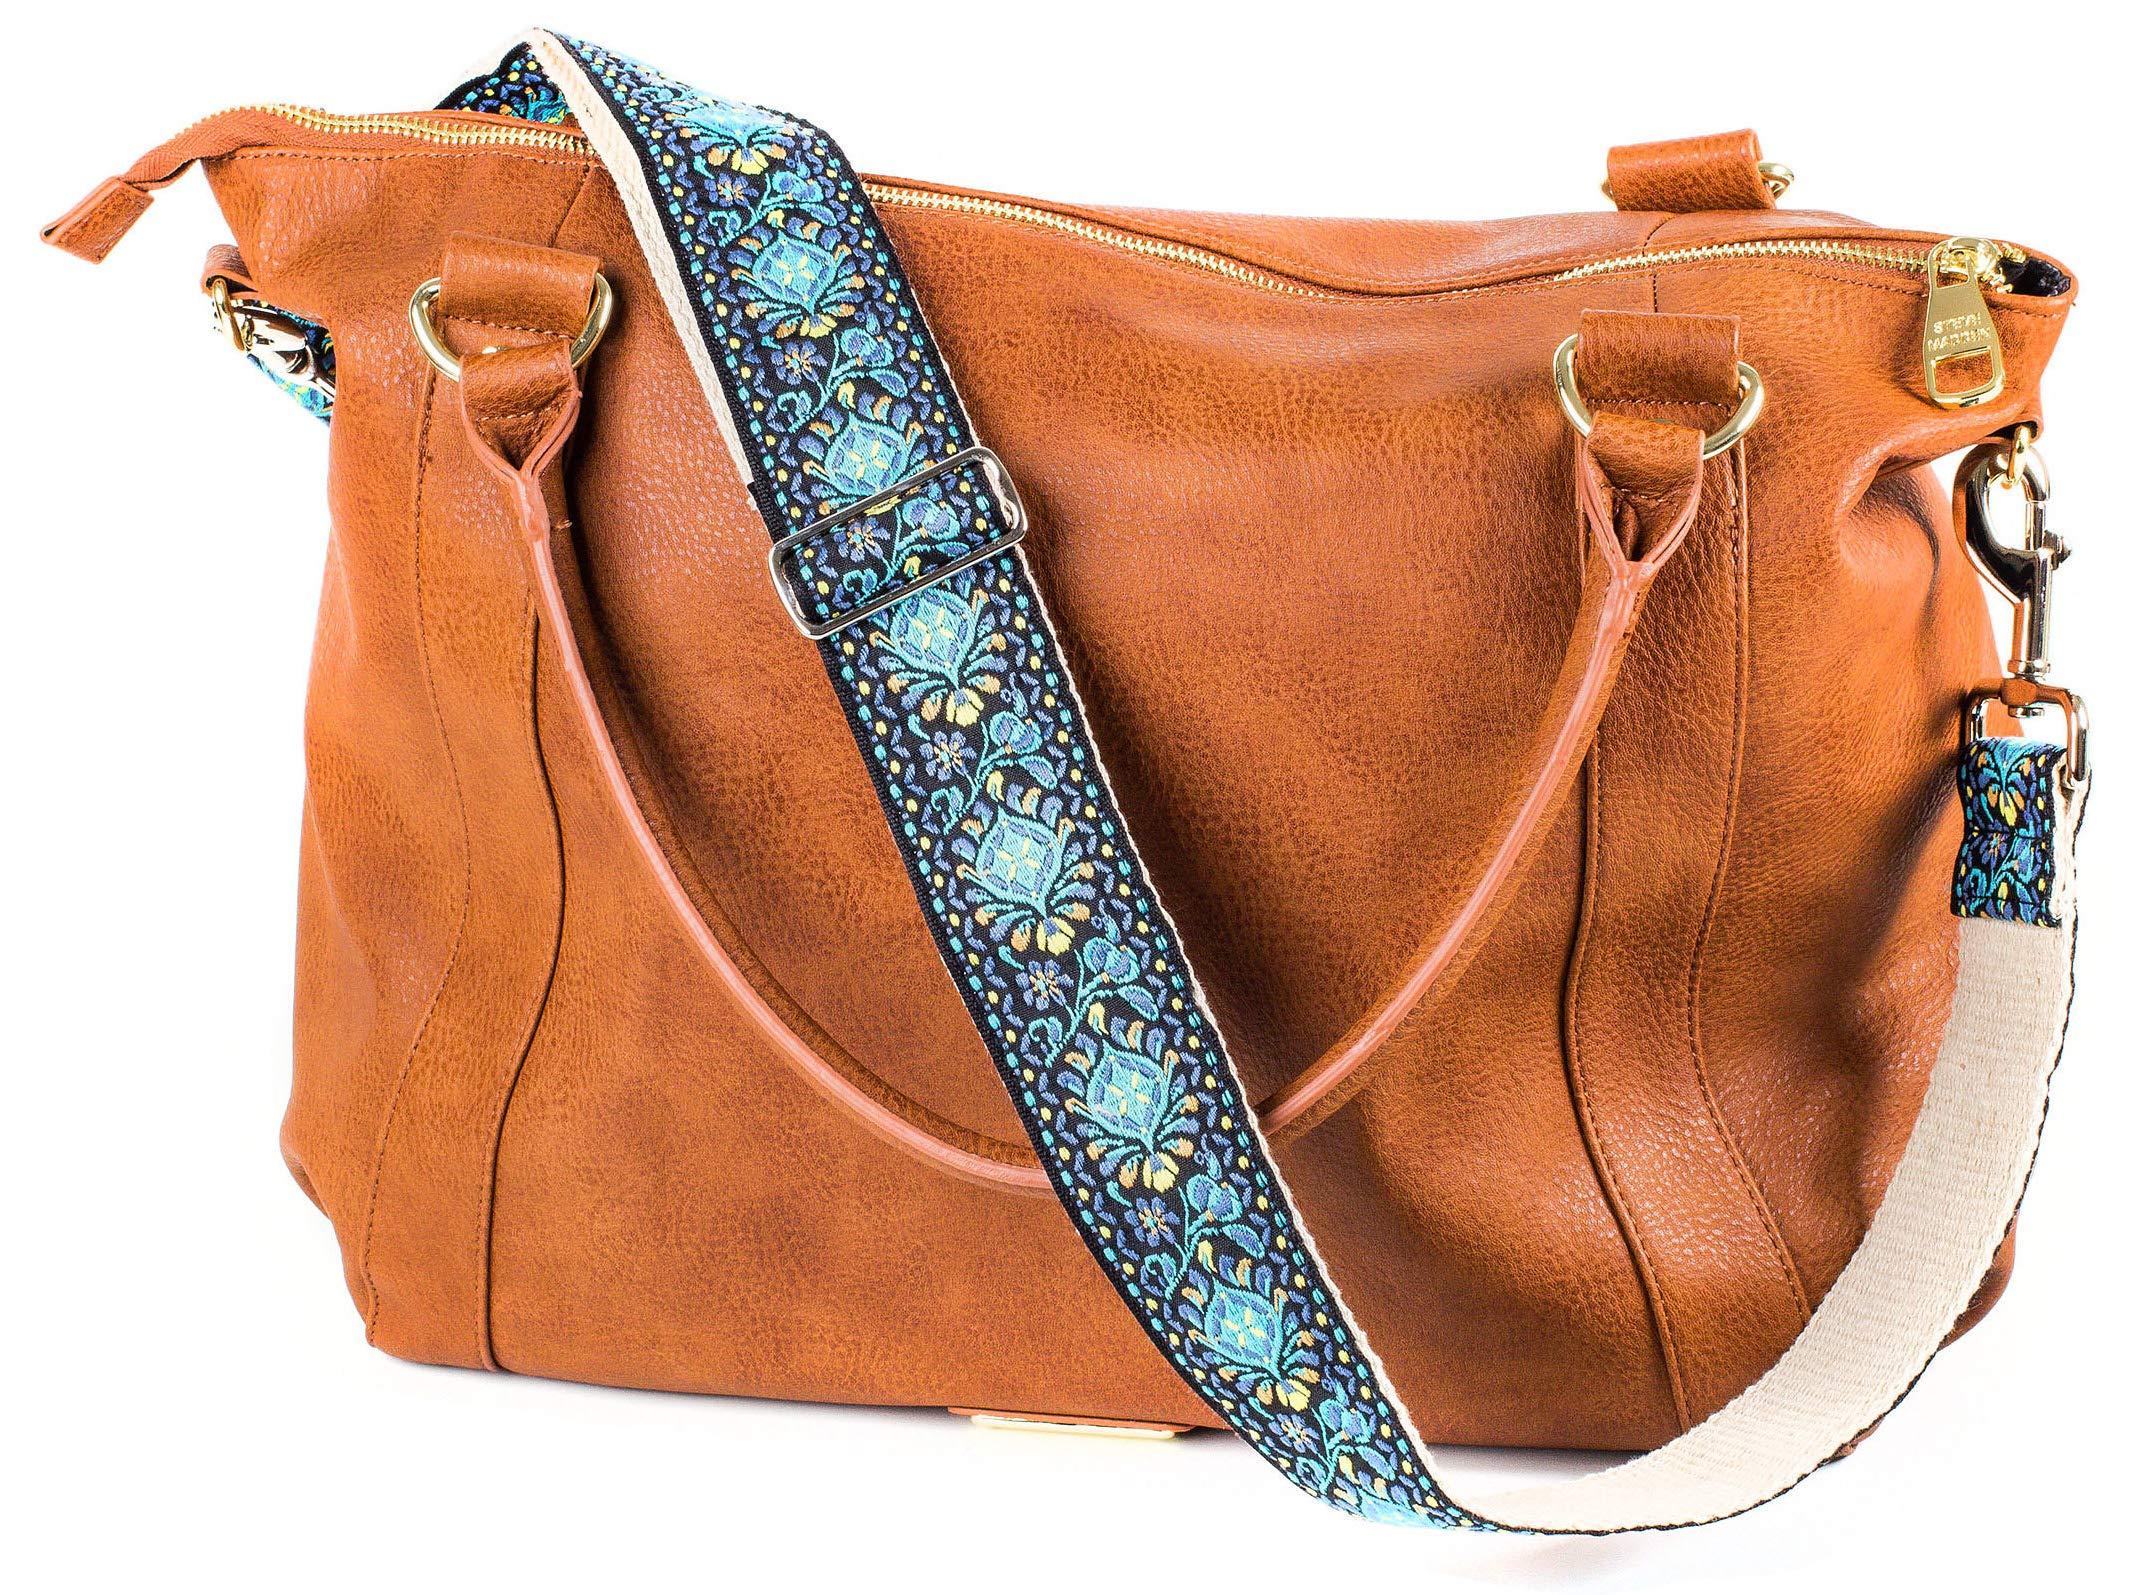 Jacquard Woven Blue Handbag & Purse Strap Replacement Embroidered Guitar Strap Styled Shoulder Bag Strap - Adjustable Bag Strap For Tote Bag And Messenger Bags –Gold Hardware